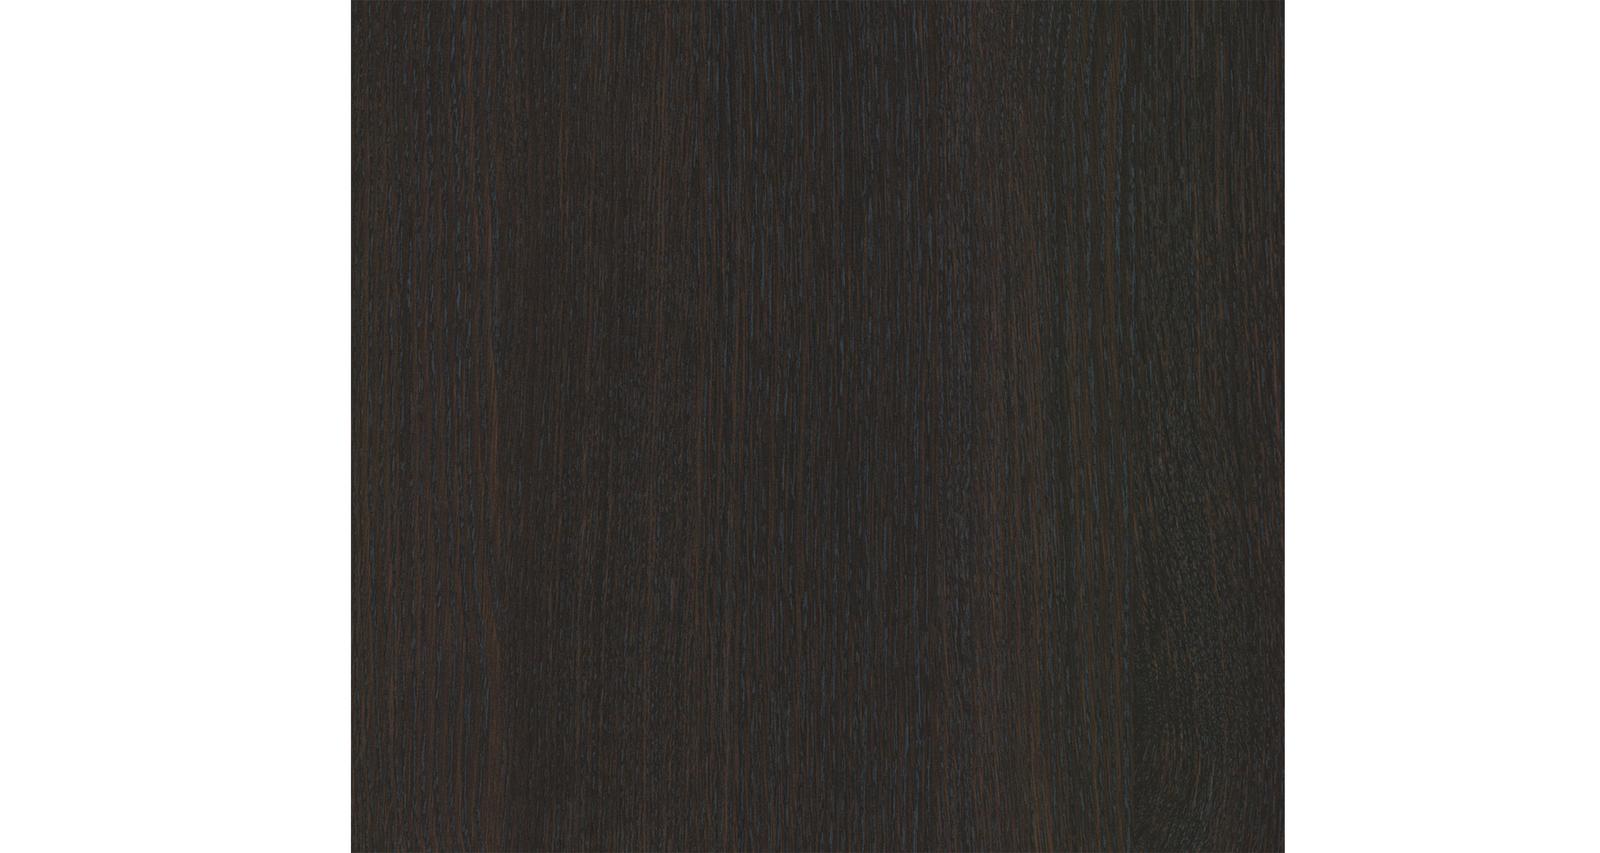 Шкаф-купе трехдверный Манчестер 234 см (дуб феррара+зеркало) от HomeMe.ru